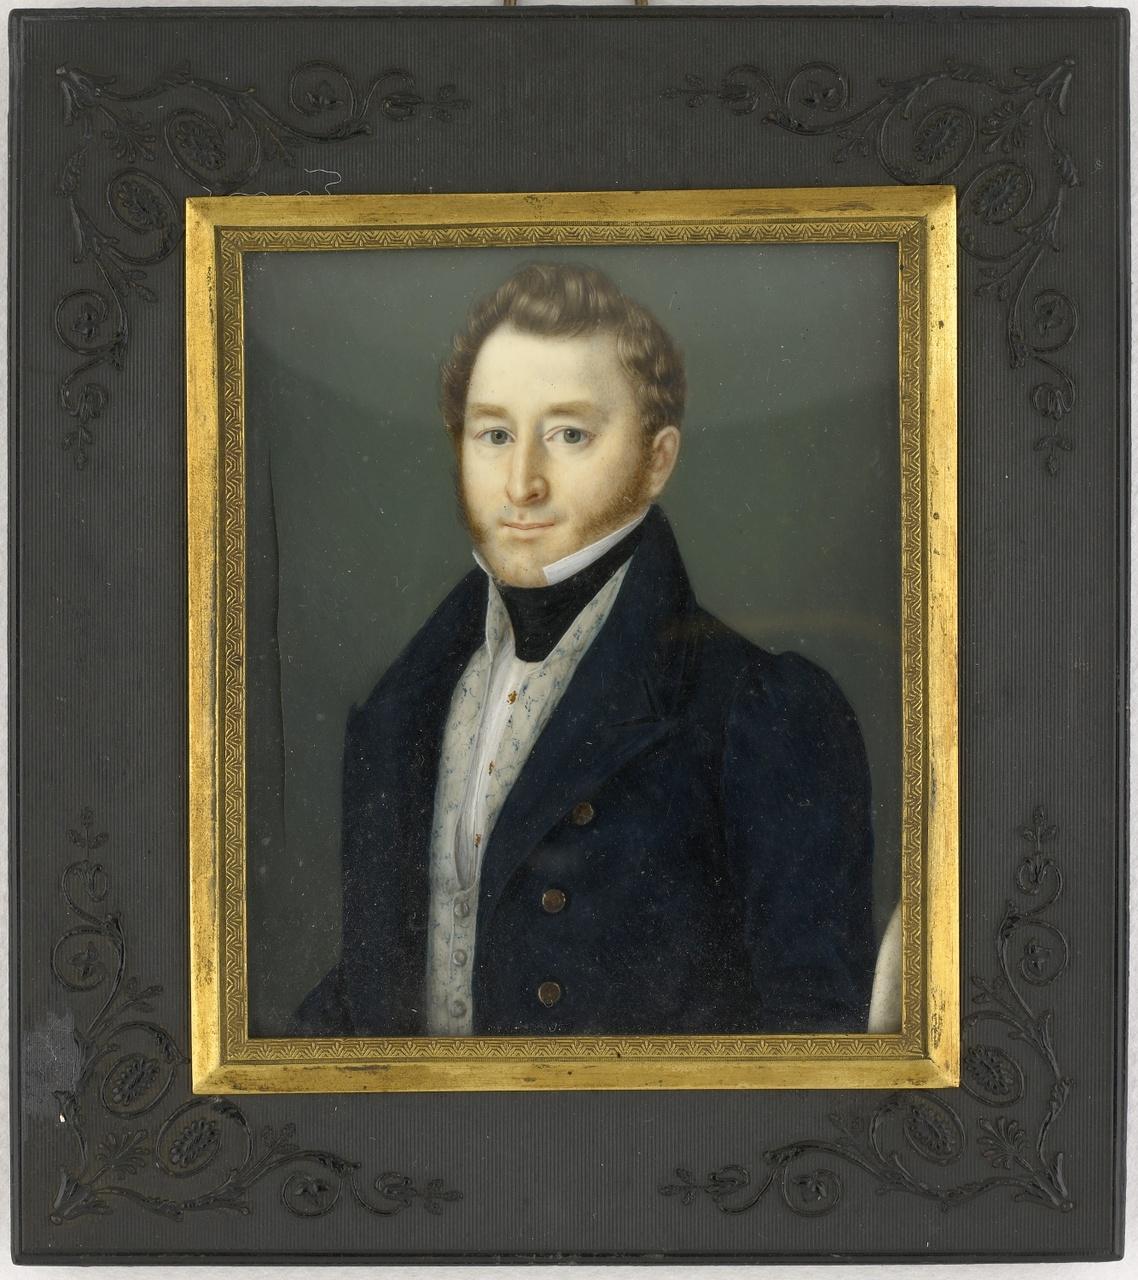 Miniatuurportret van Jhr. Pieter Damas van Citters I (1802-1888), Anoniem